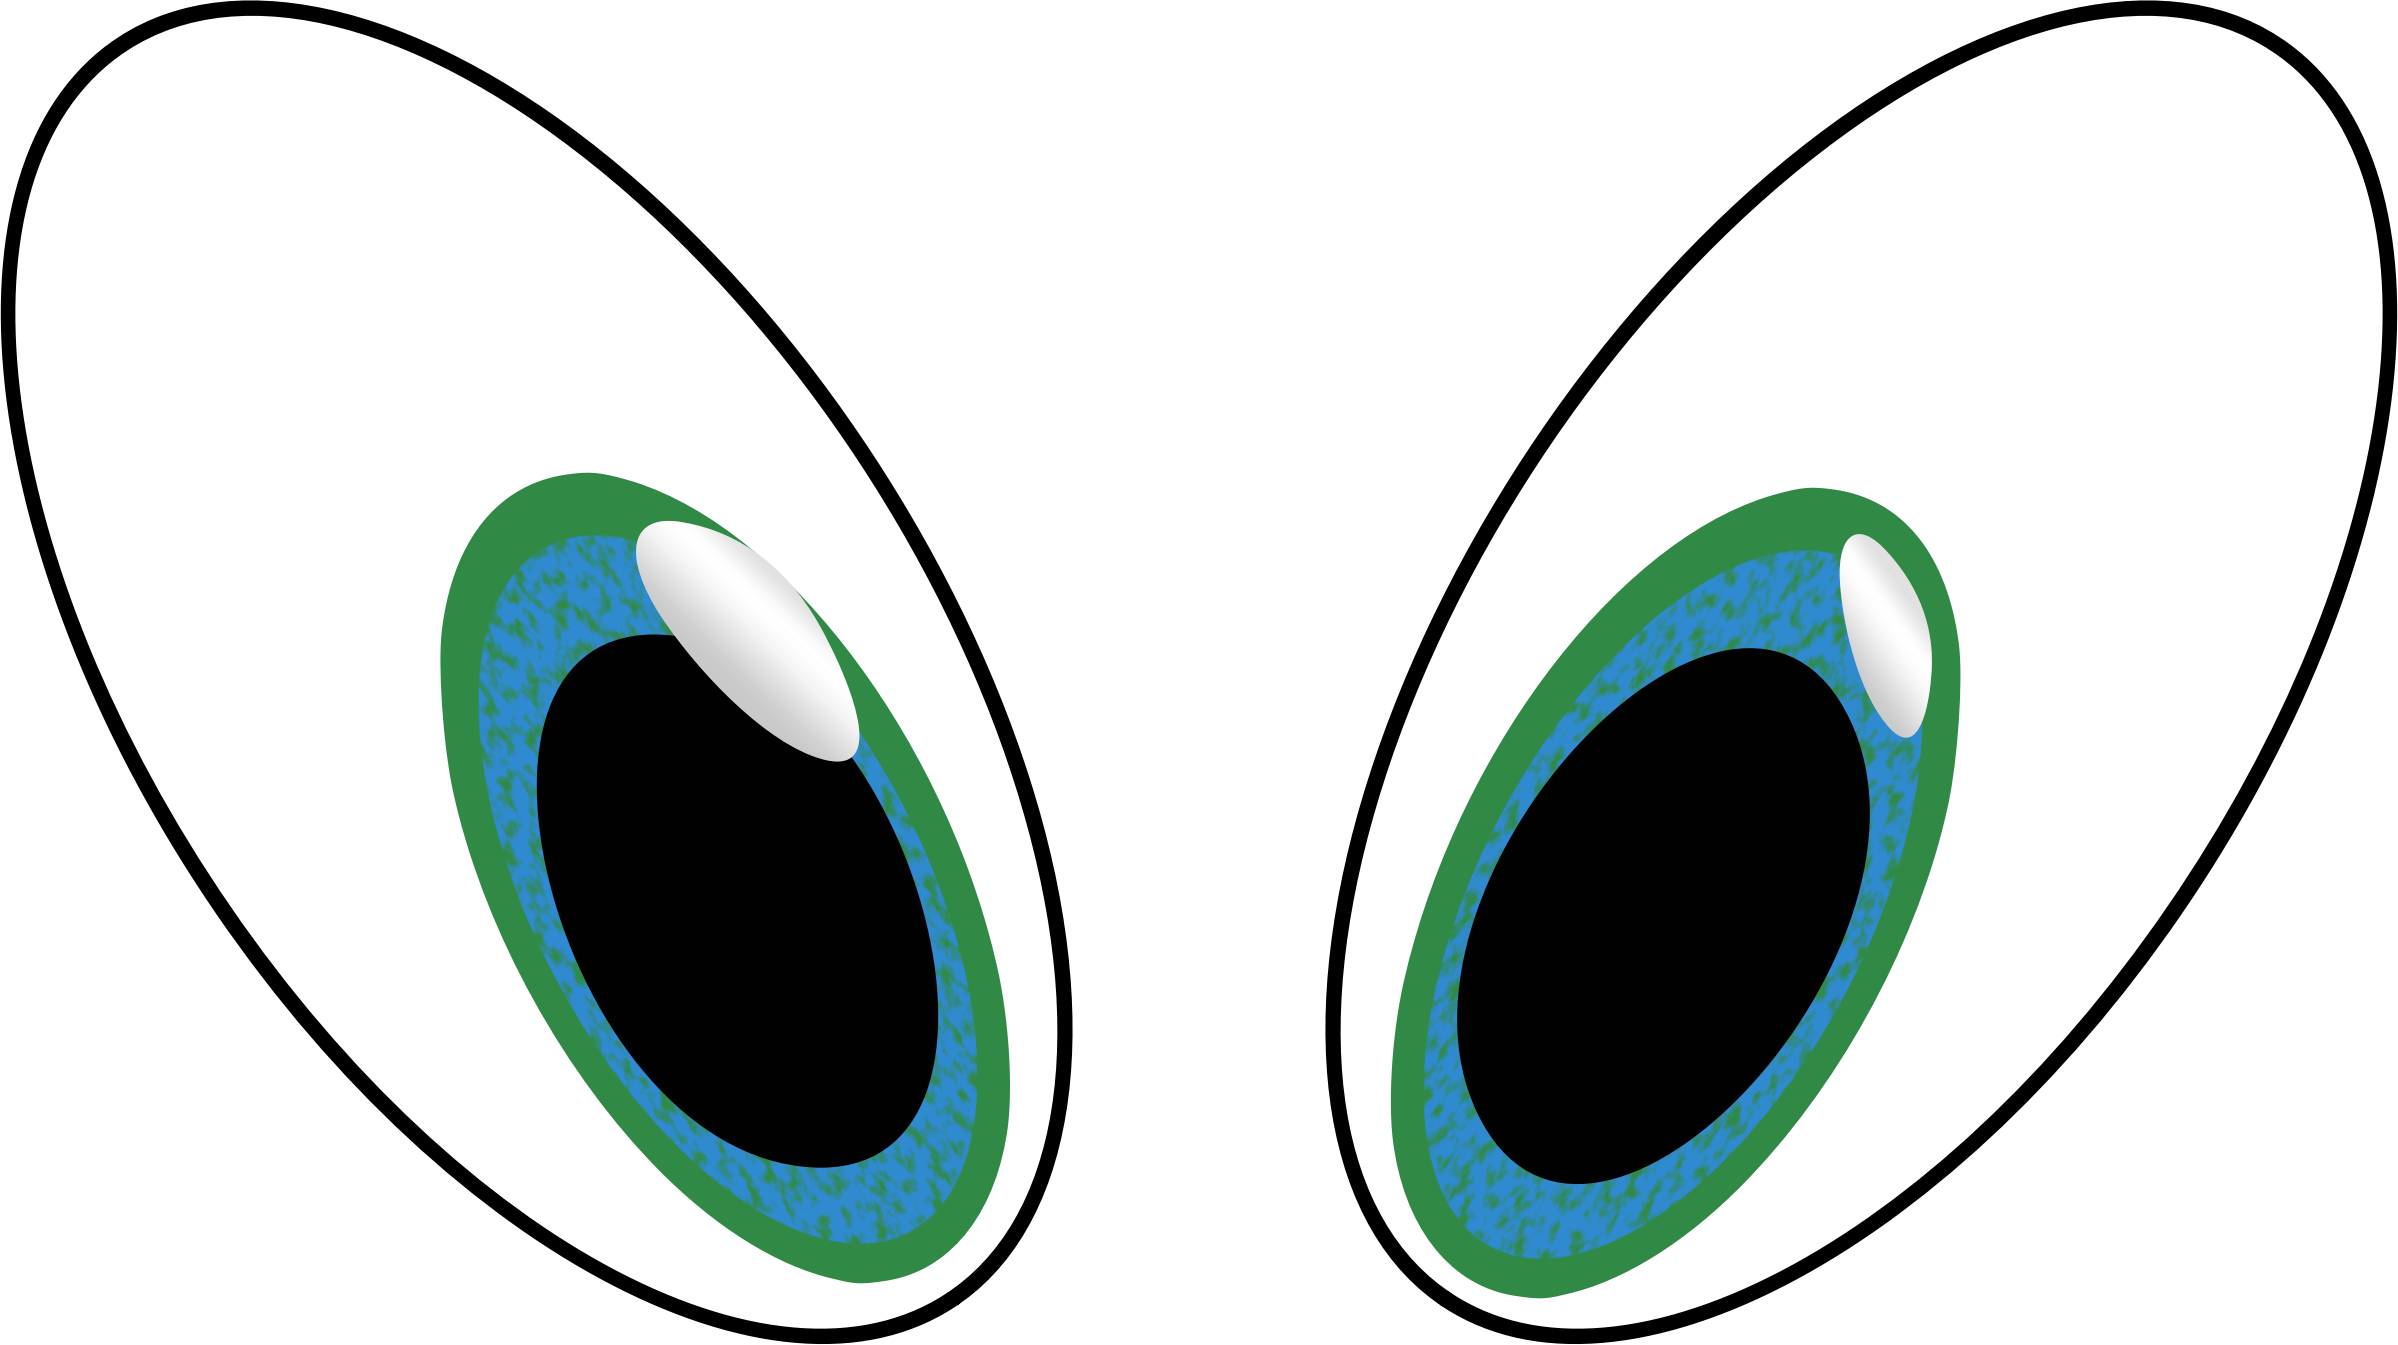 Cartoon Eyes Vector Clipart Image Free Stock Photo Public Domain Photo Cc0 Images